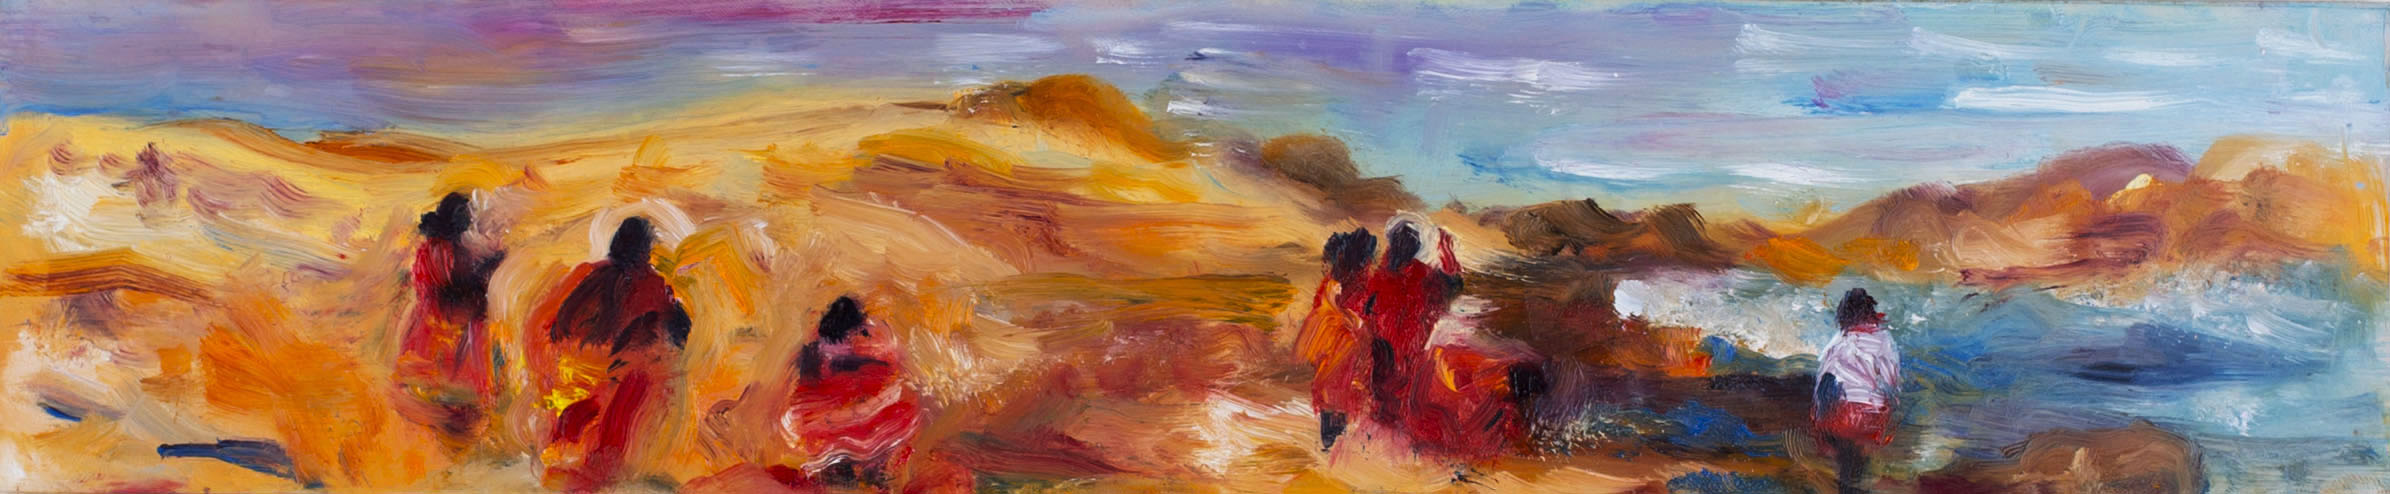 "Medium:  Oil Paint on Mylar   Dimensions:  12¾""x2½"""